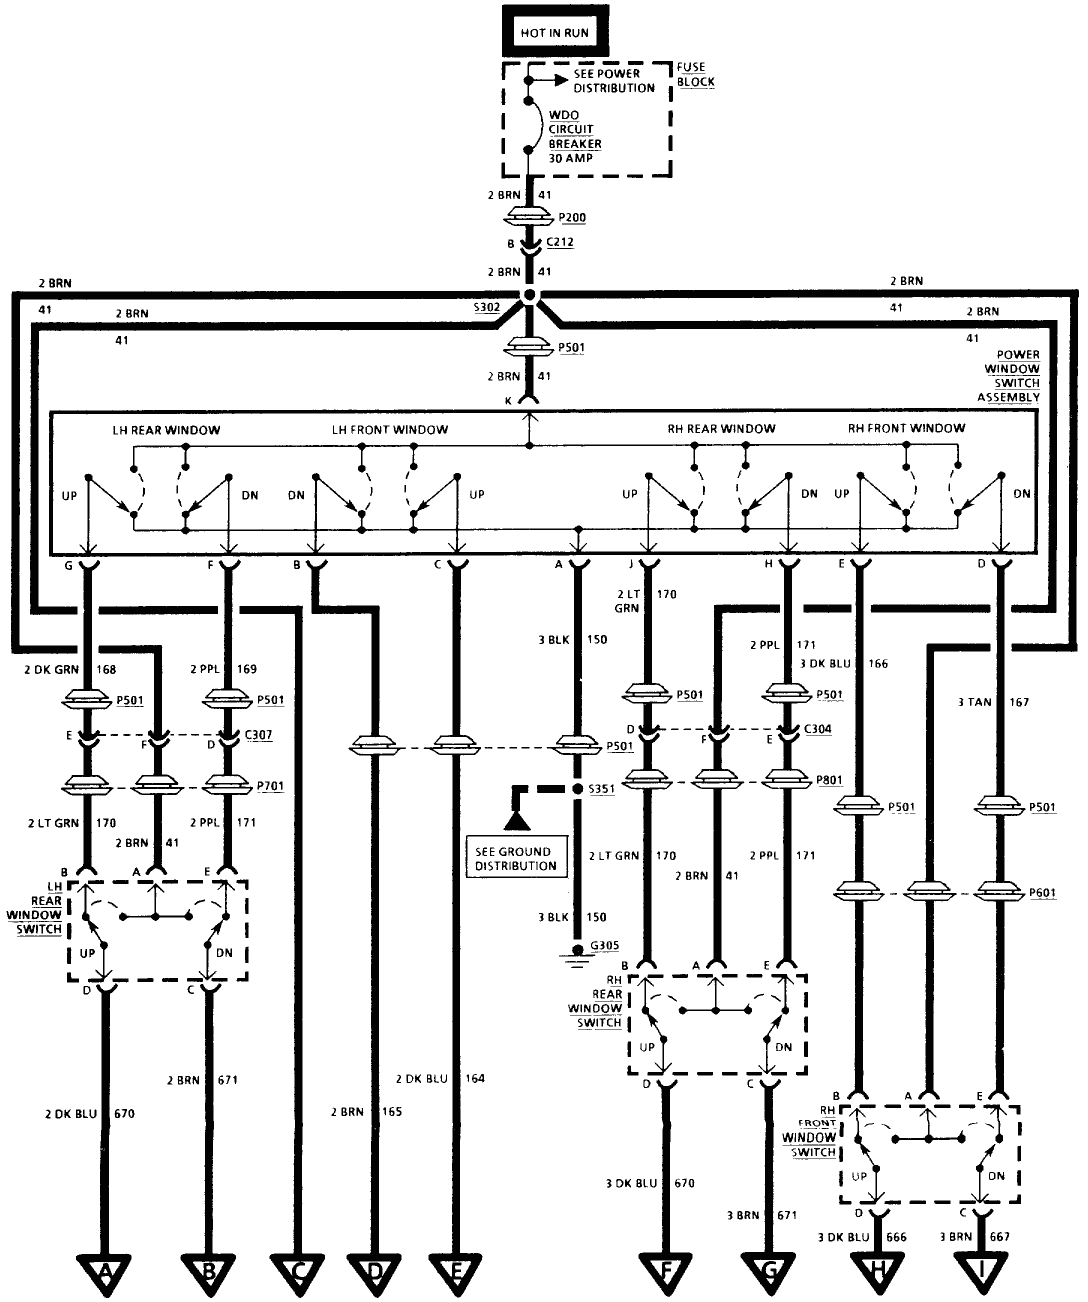 94 oldsmobile cutl supreme wiring diagram schema diagram database mix 94 oldsmobile cutl supreme wiring diagram